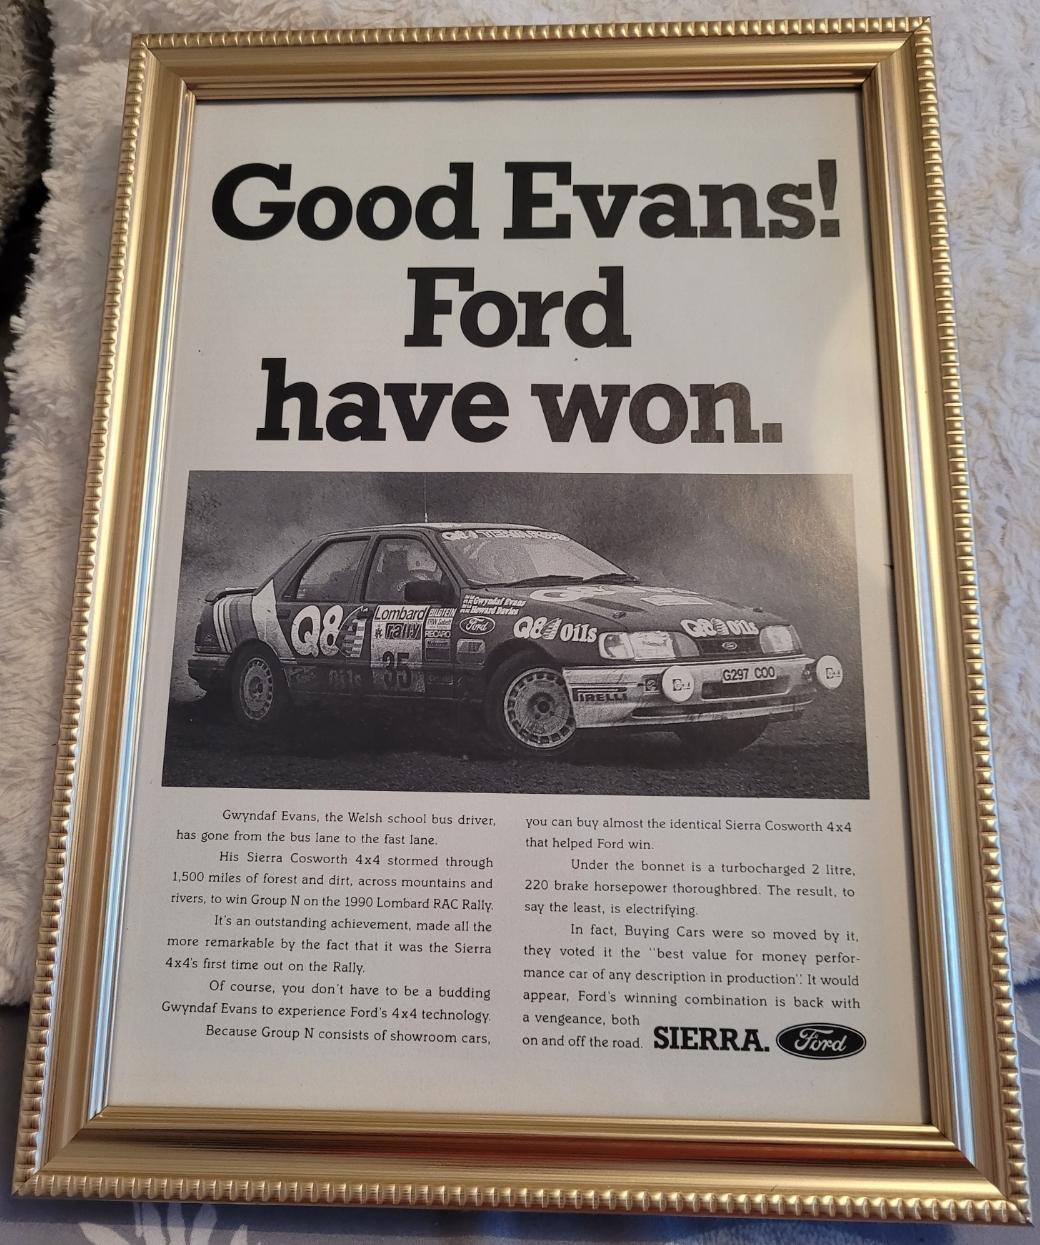 Original 1991 Ford Sierra Cosworth Framed Advert